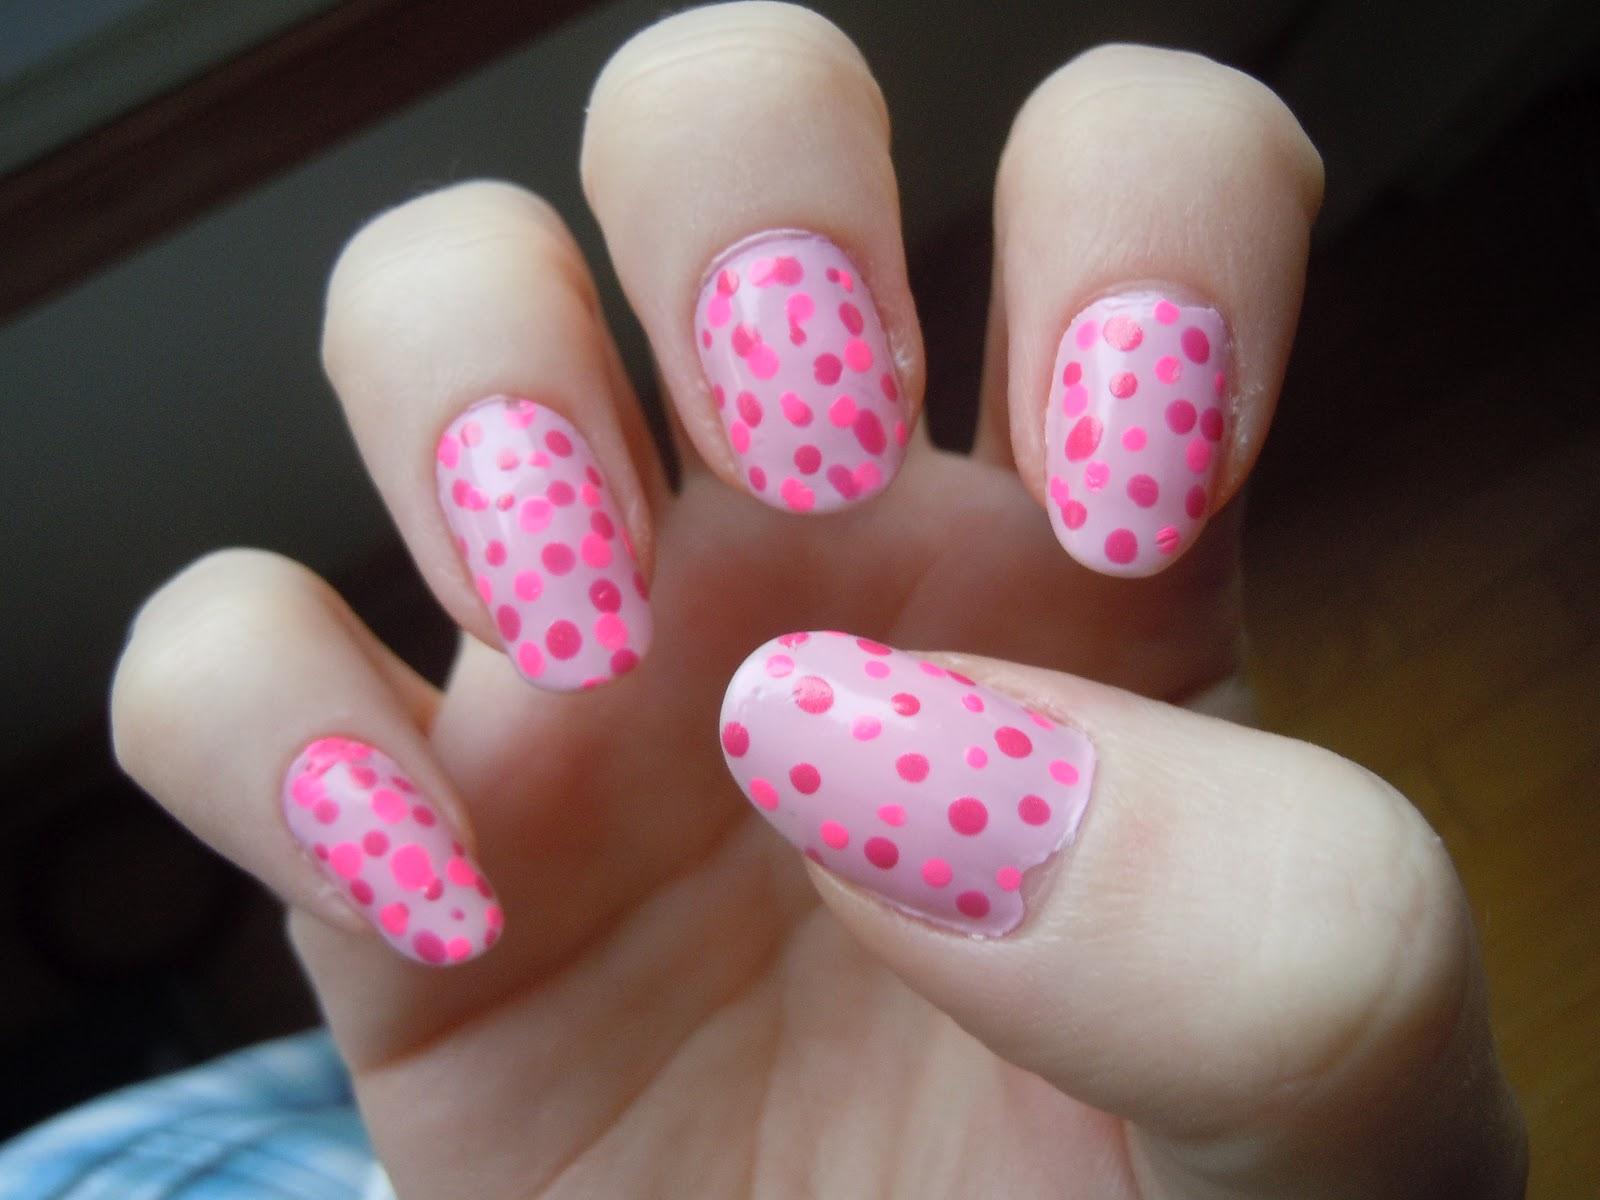 little girl pink nail designs little girl nail designs - Little Girl Nail Design Ideas